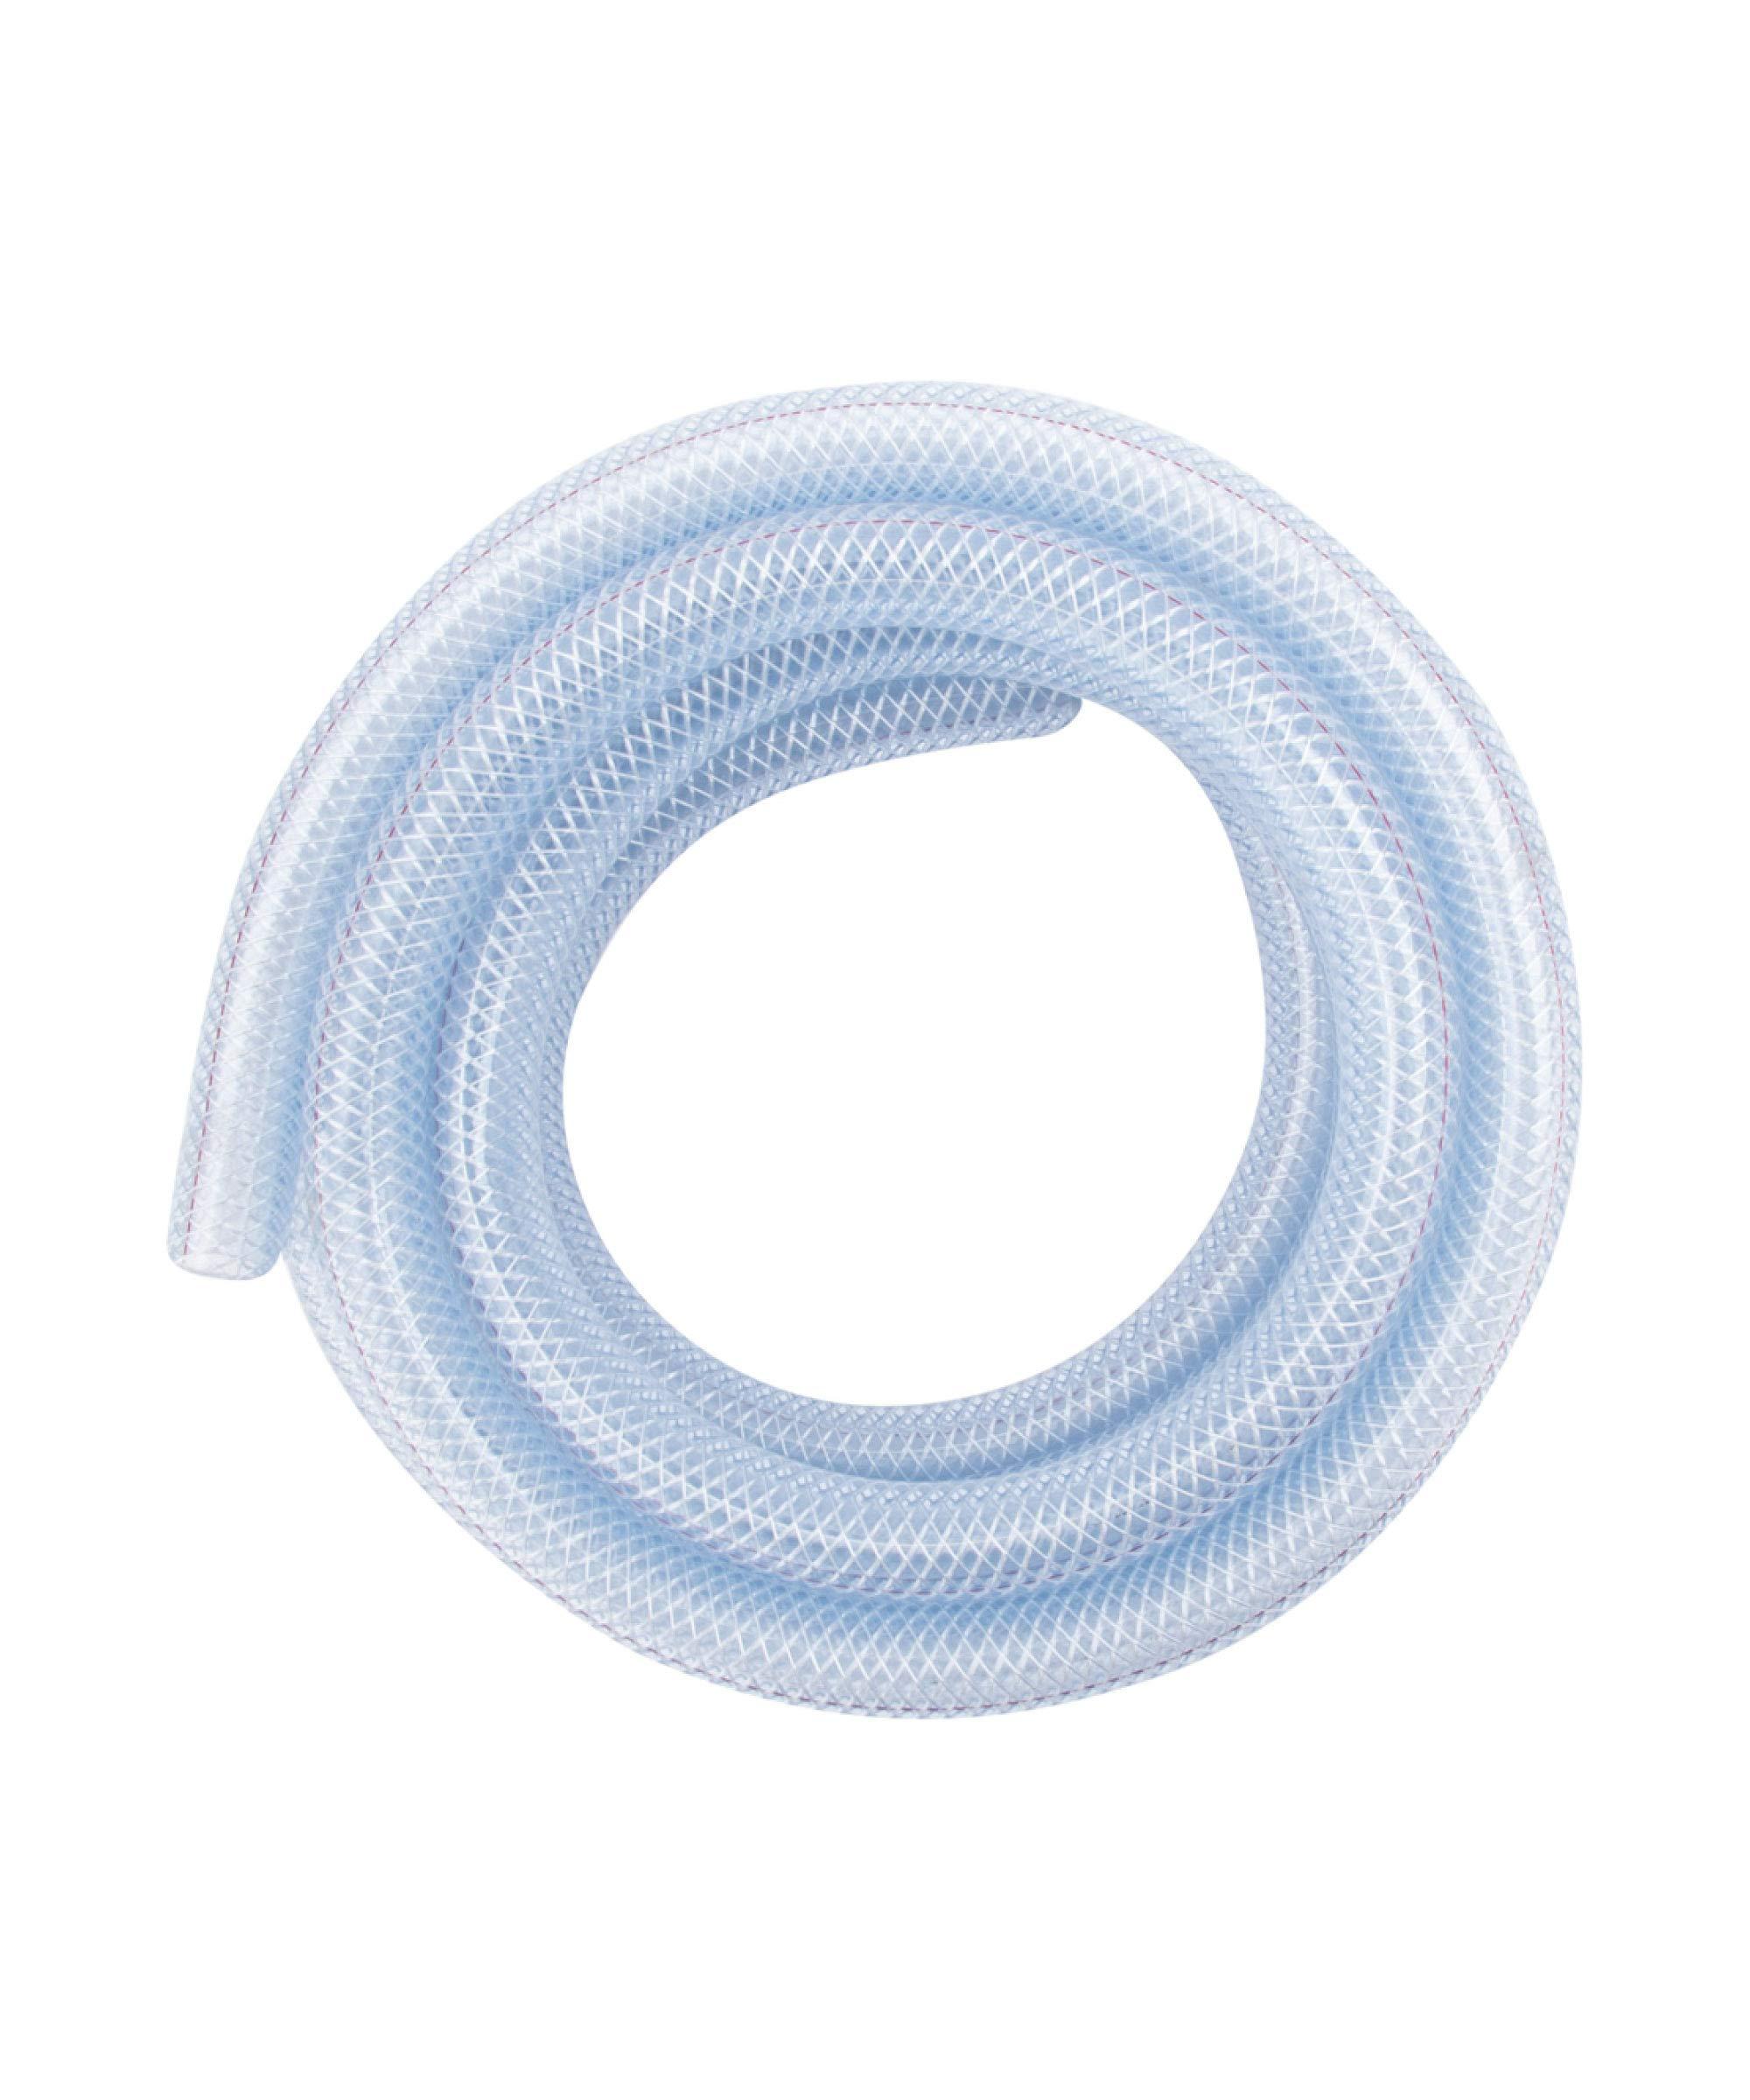 LDR Industries 516 B1210 Nylon Tubing 1/2'' x 10' Clear